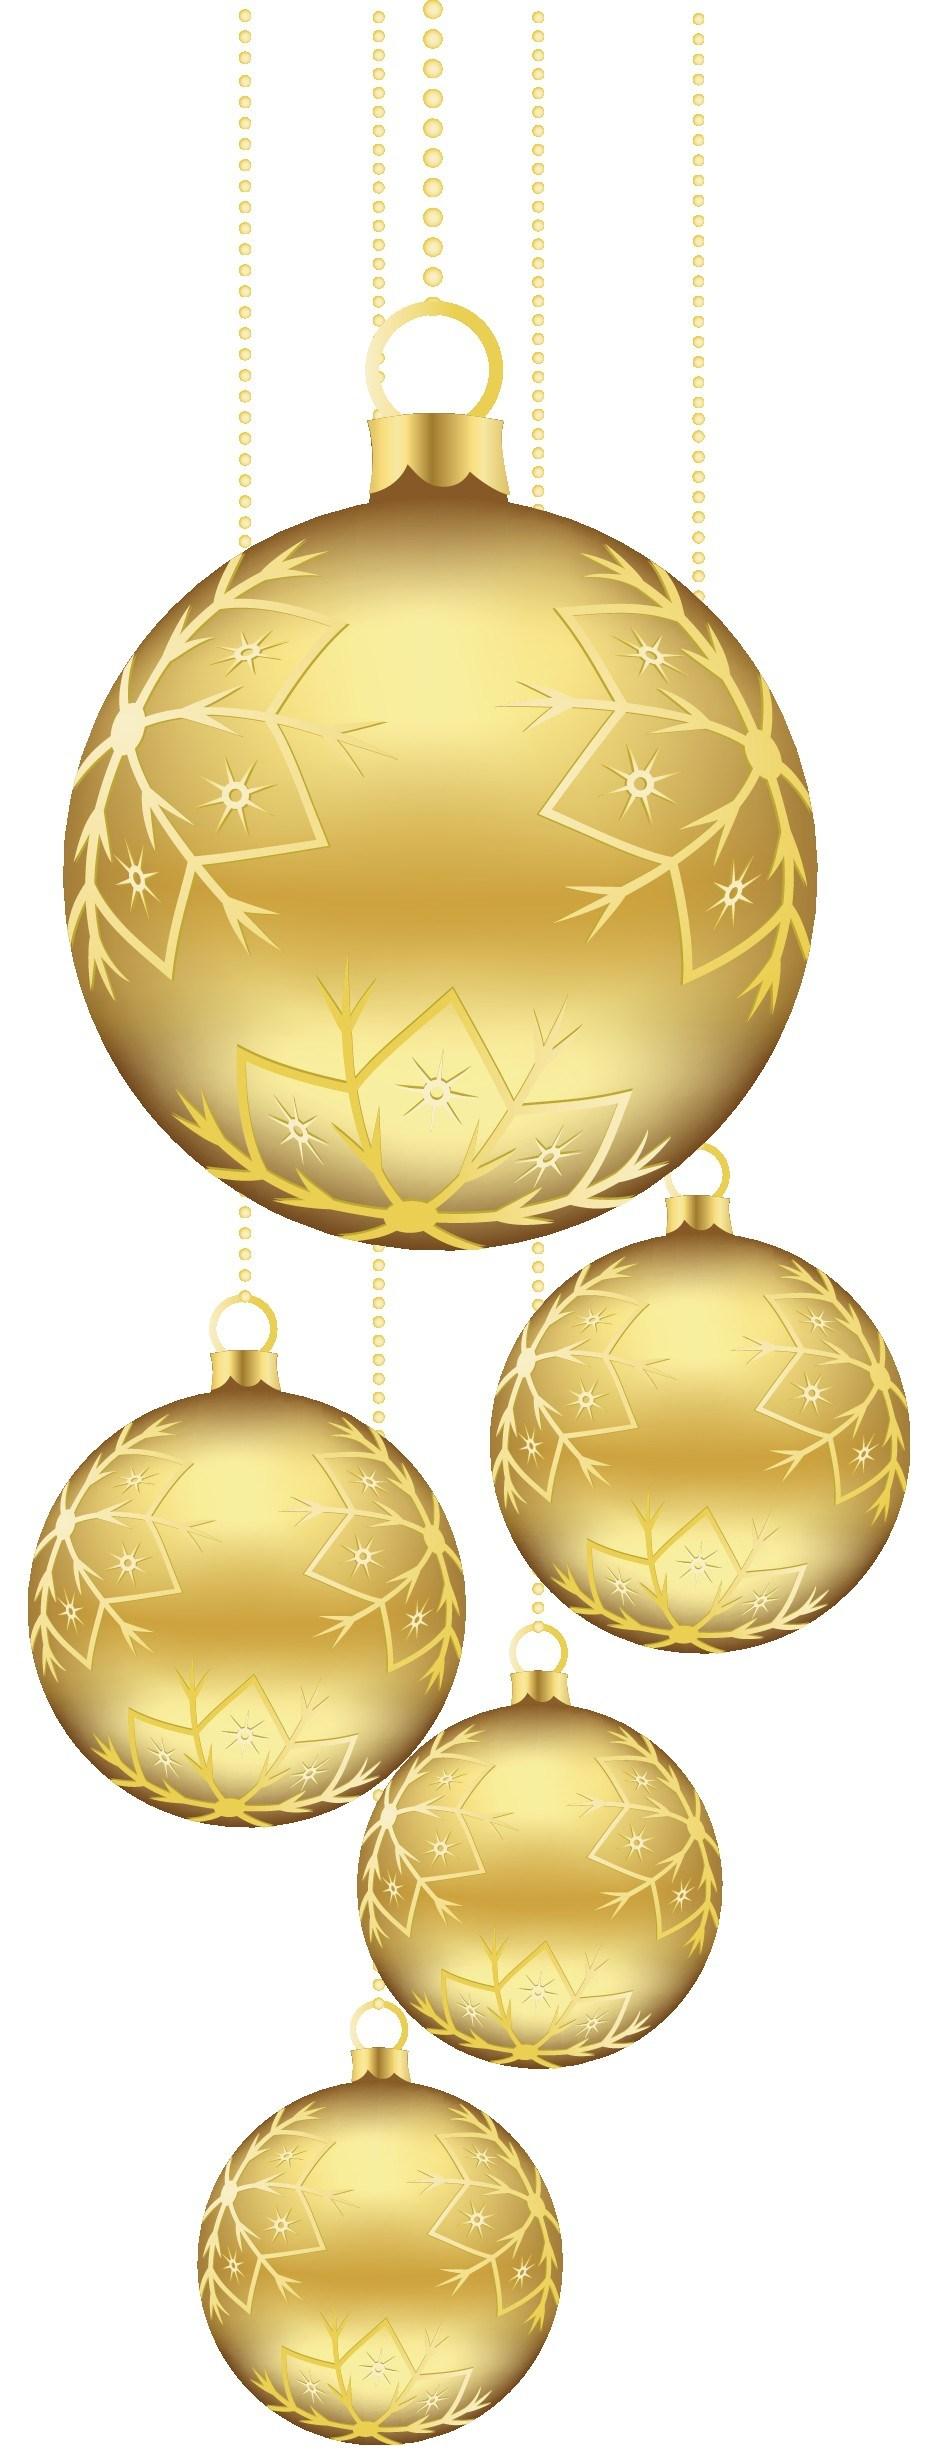 Gold christmas ornament clipart 3 » Clipart Portal.